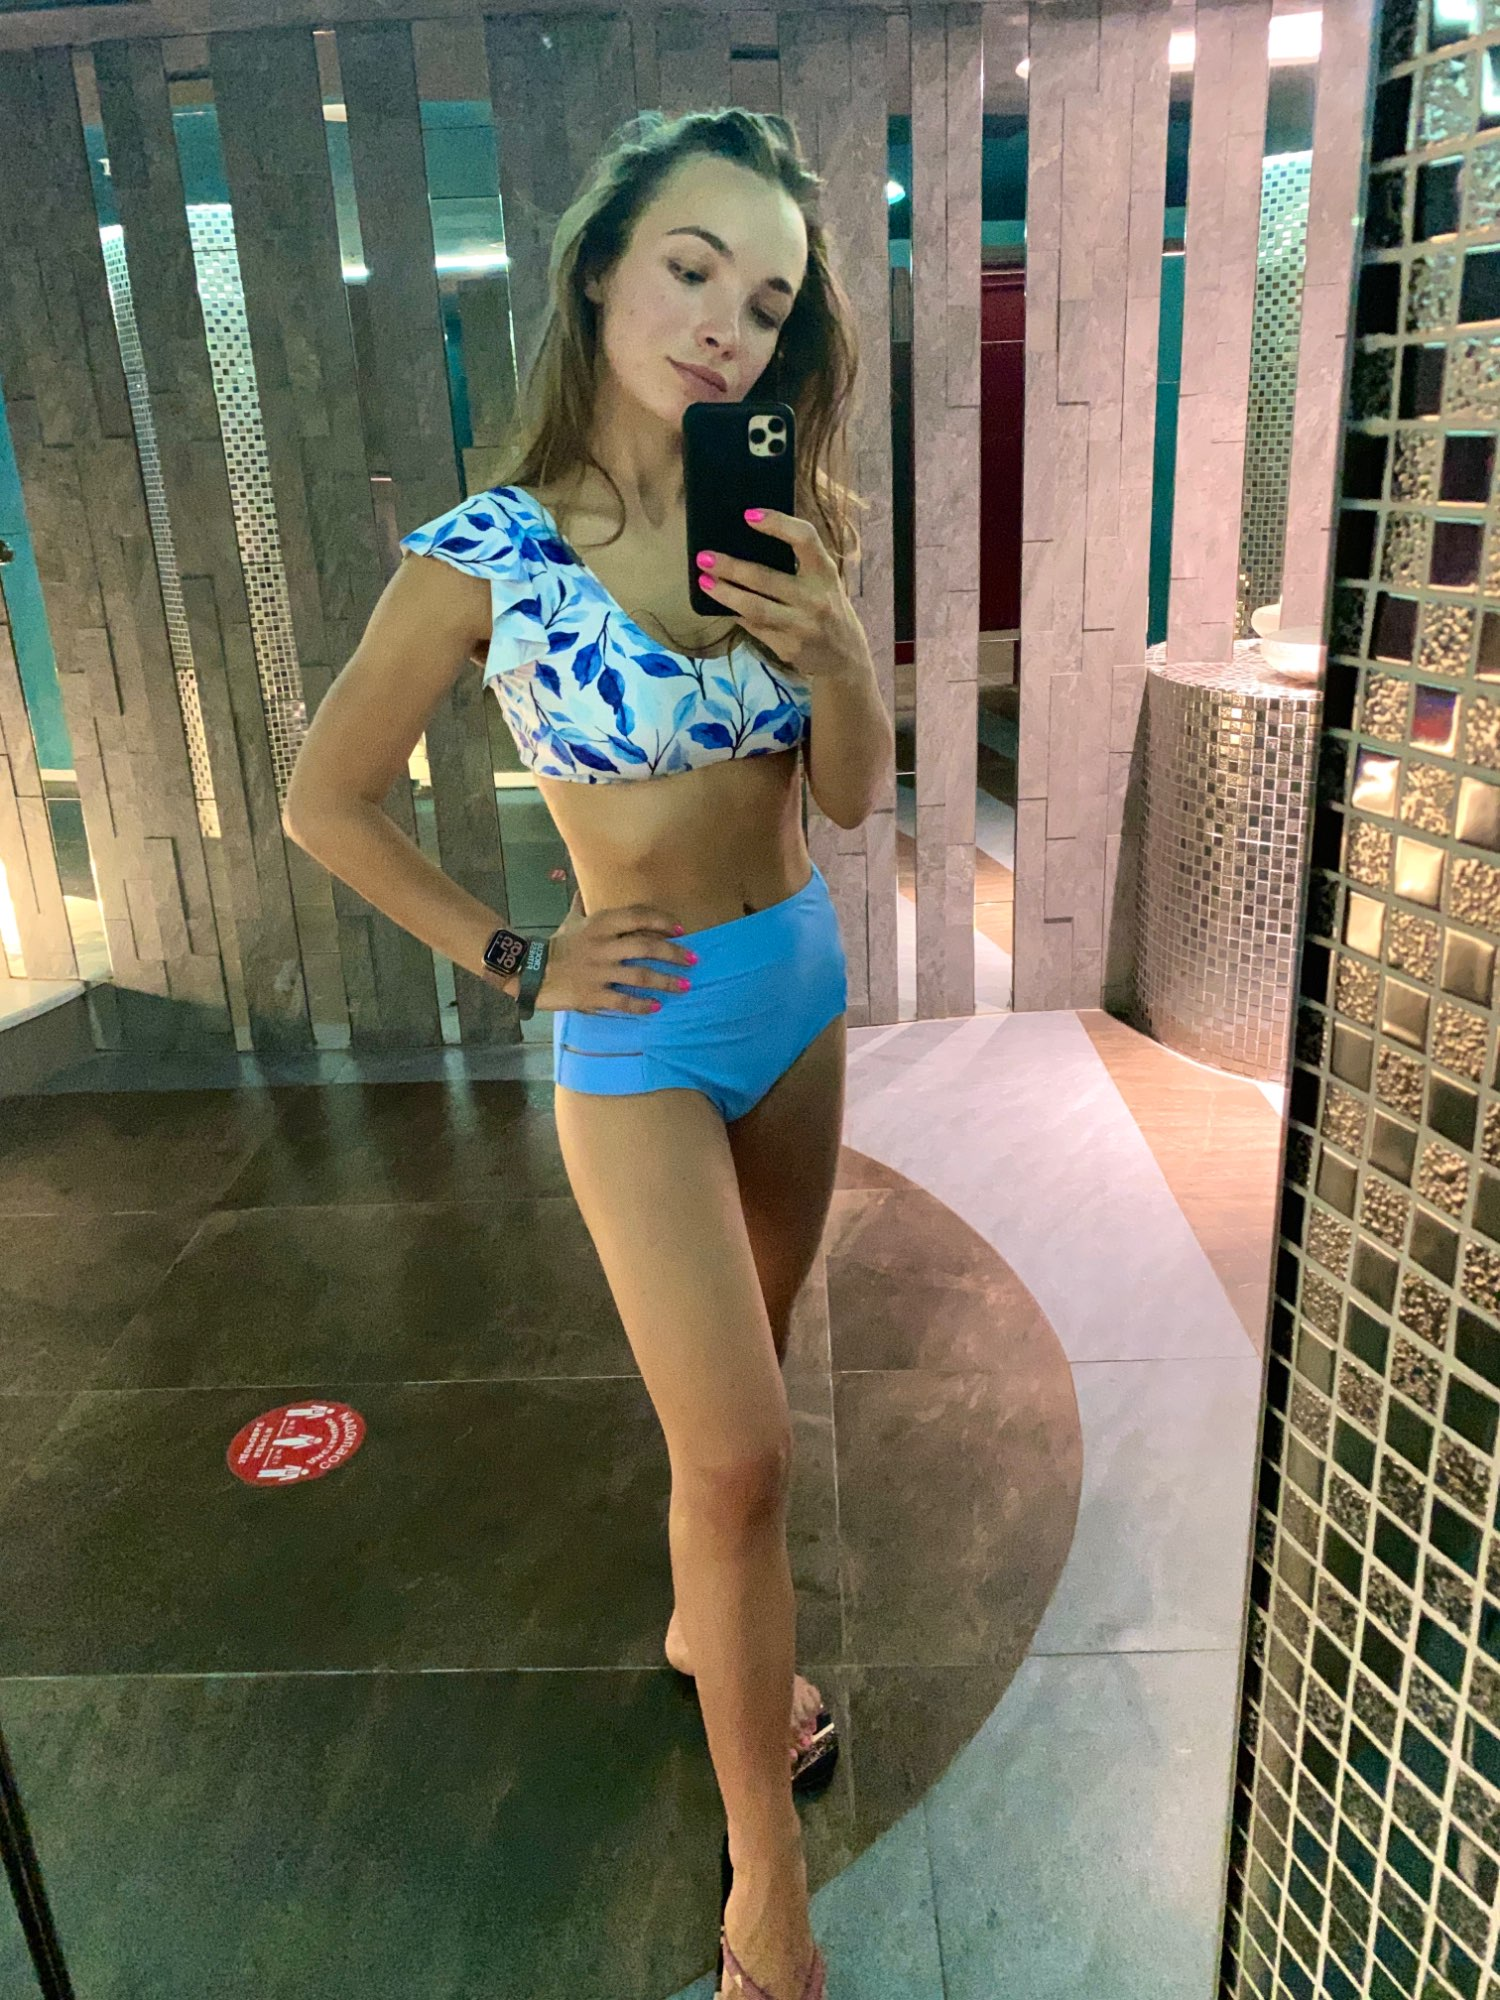 2021 New Sexy One Piece Swimsuit Women Swimwear Cut Out Bathing Suit Summer Push Up Monokini Print Swim Suit  Beach Wear Female|Body Suits|   - AliExpress